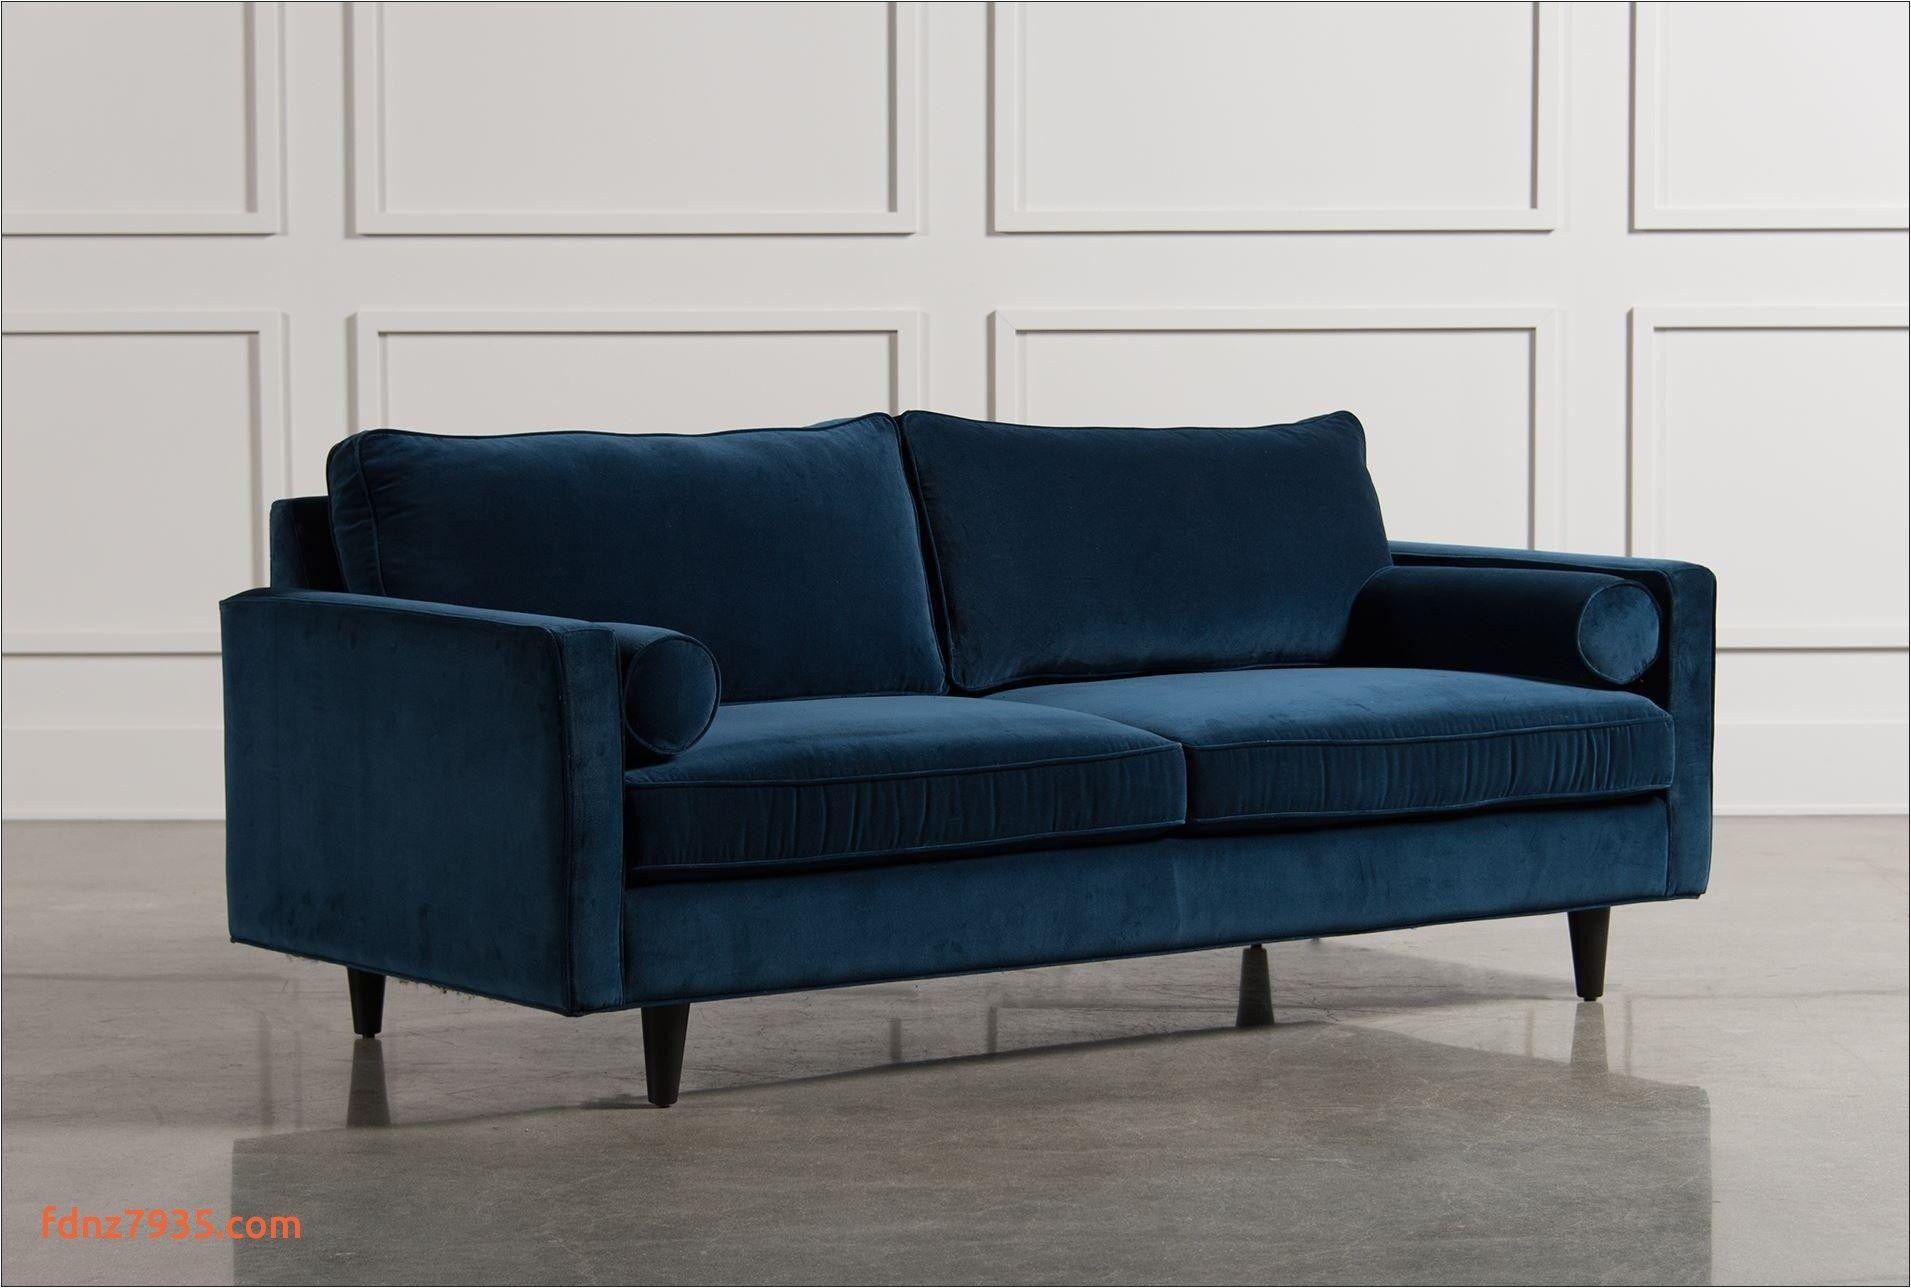 21 Frische Weisse Leder Schlafsofa Blaues Ledersofa Ledersofa Kleines Sofa